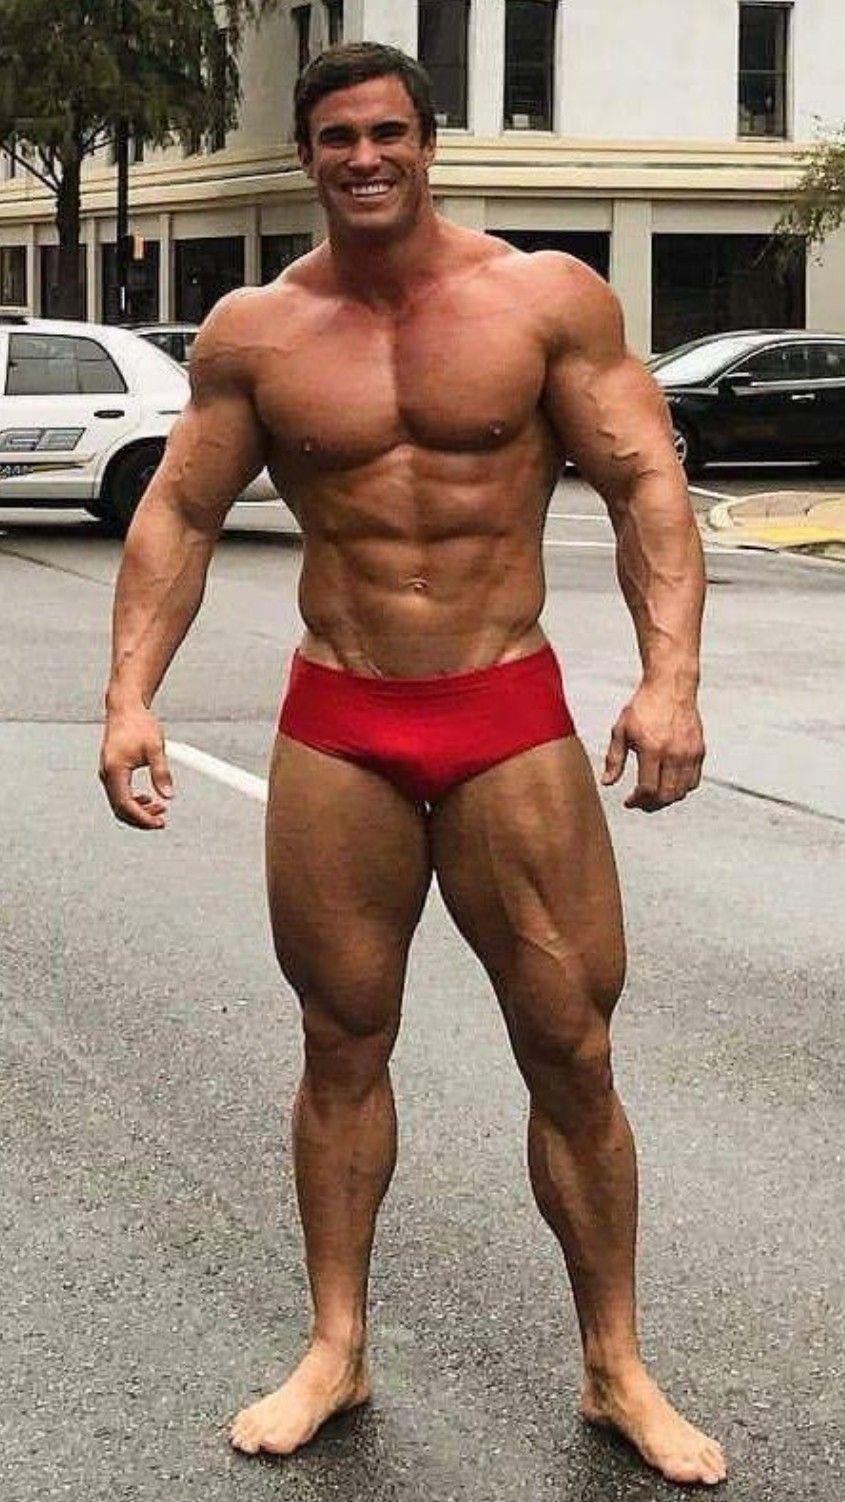 Man muscle male gay